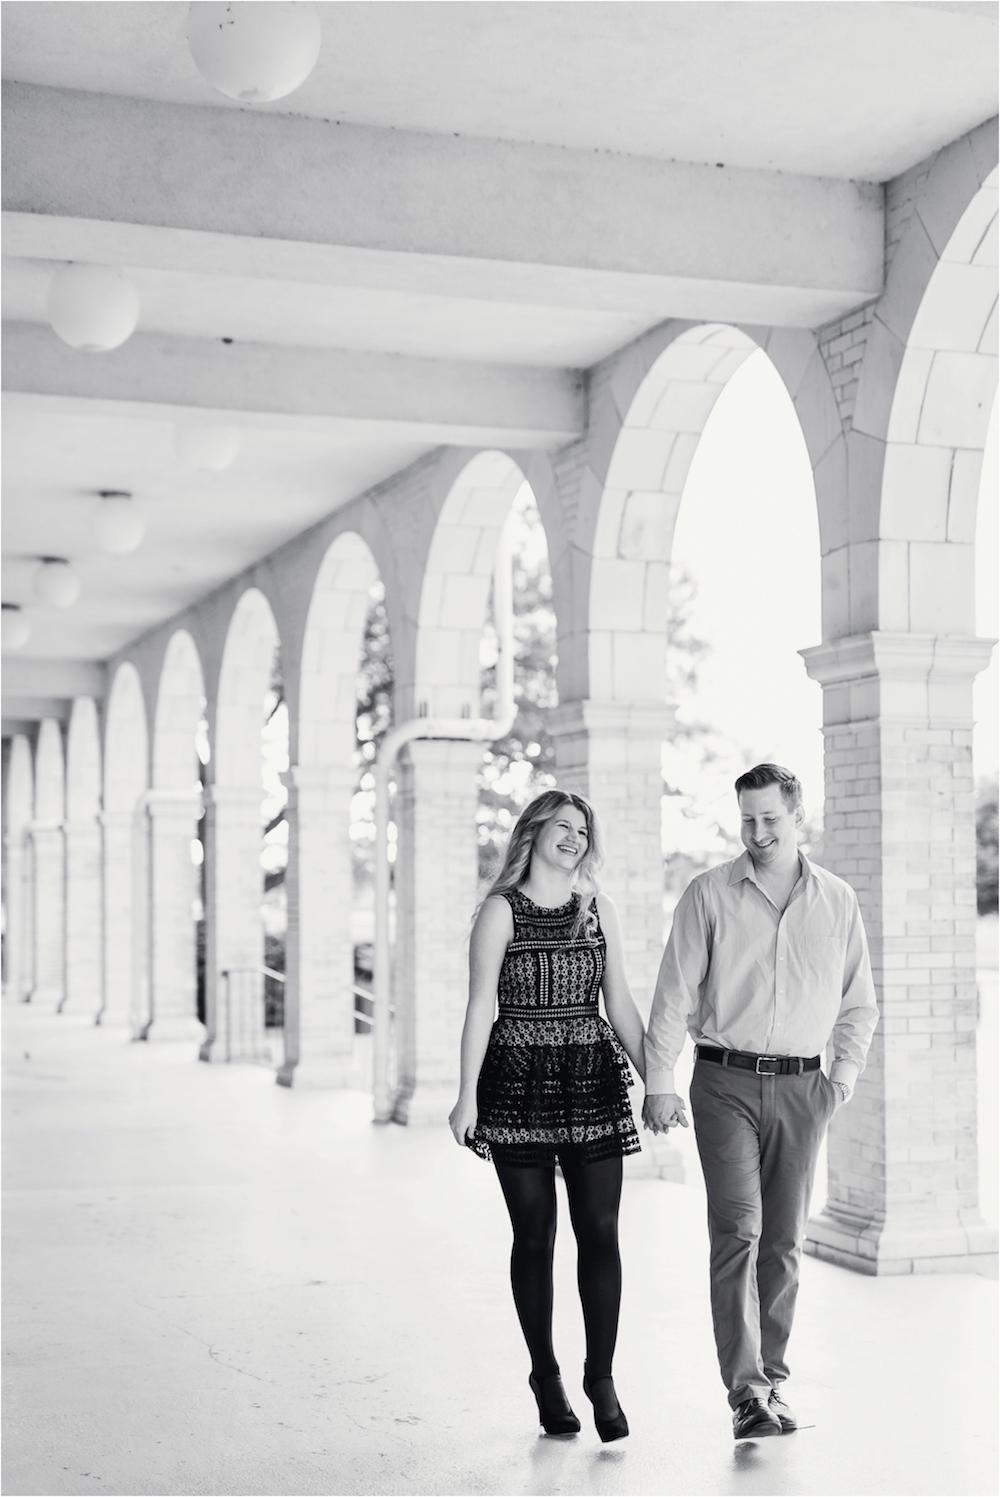 bell-isle-detroit-michigan-casino-fountain-dressy-elegant-engagement-photo-4.jpg